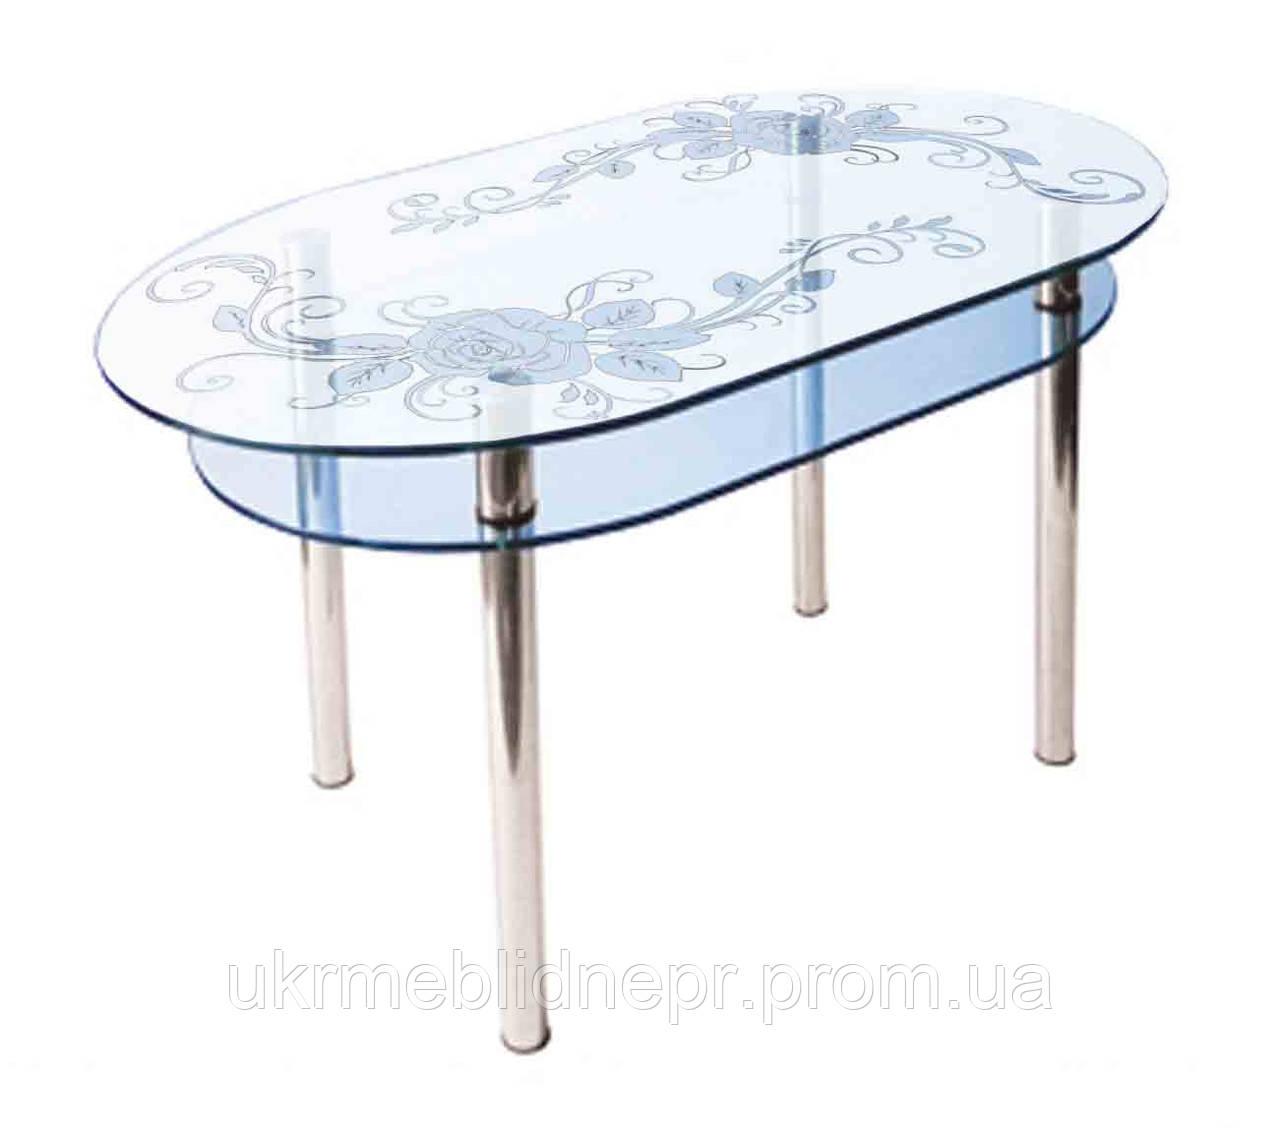 Обеденный стол КС- 6